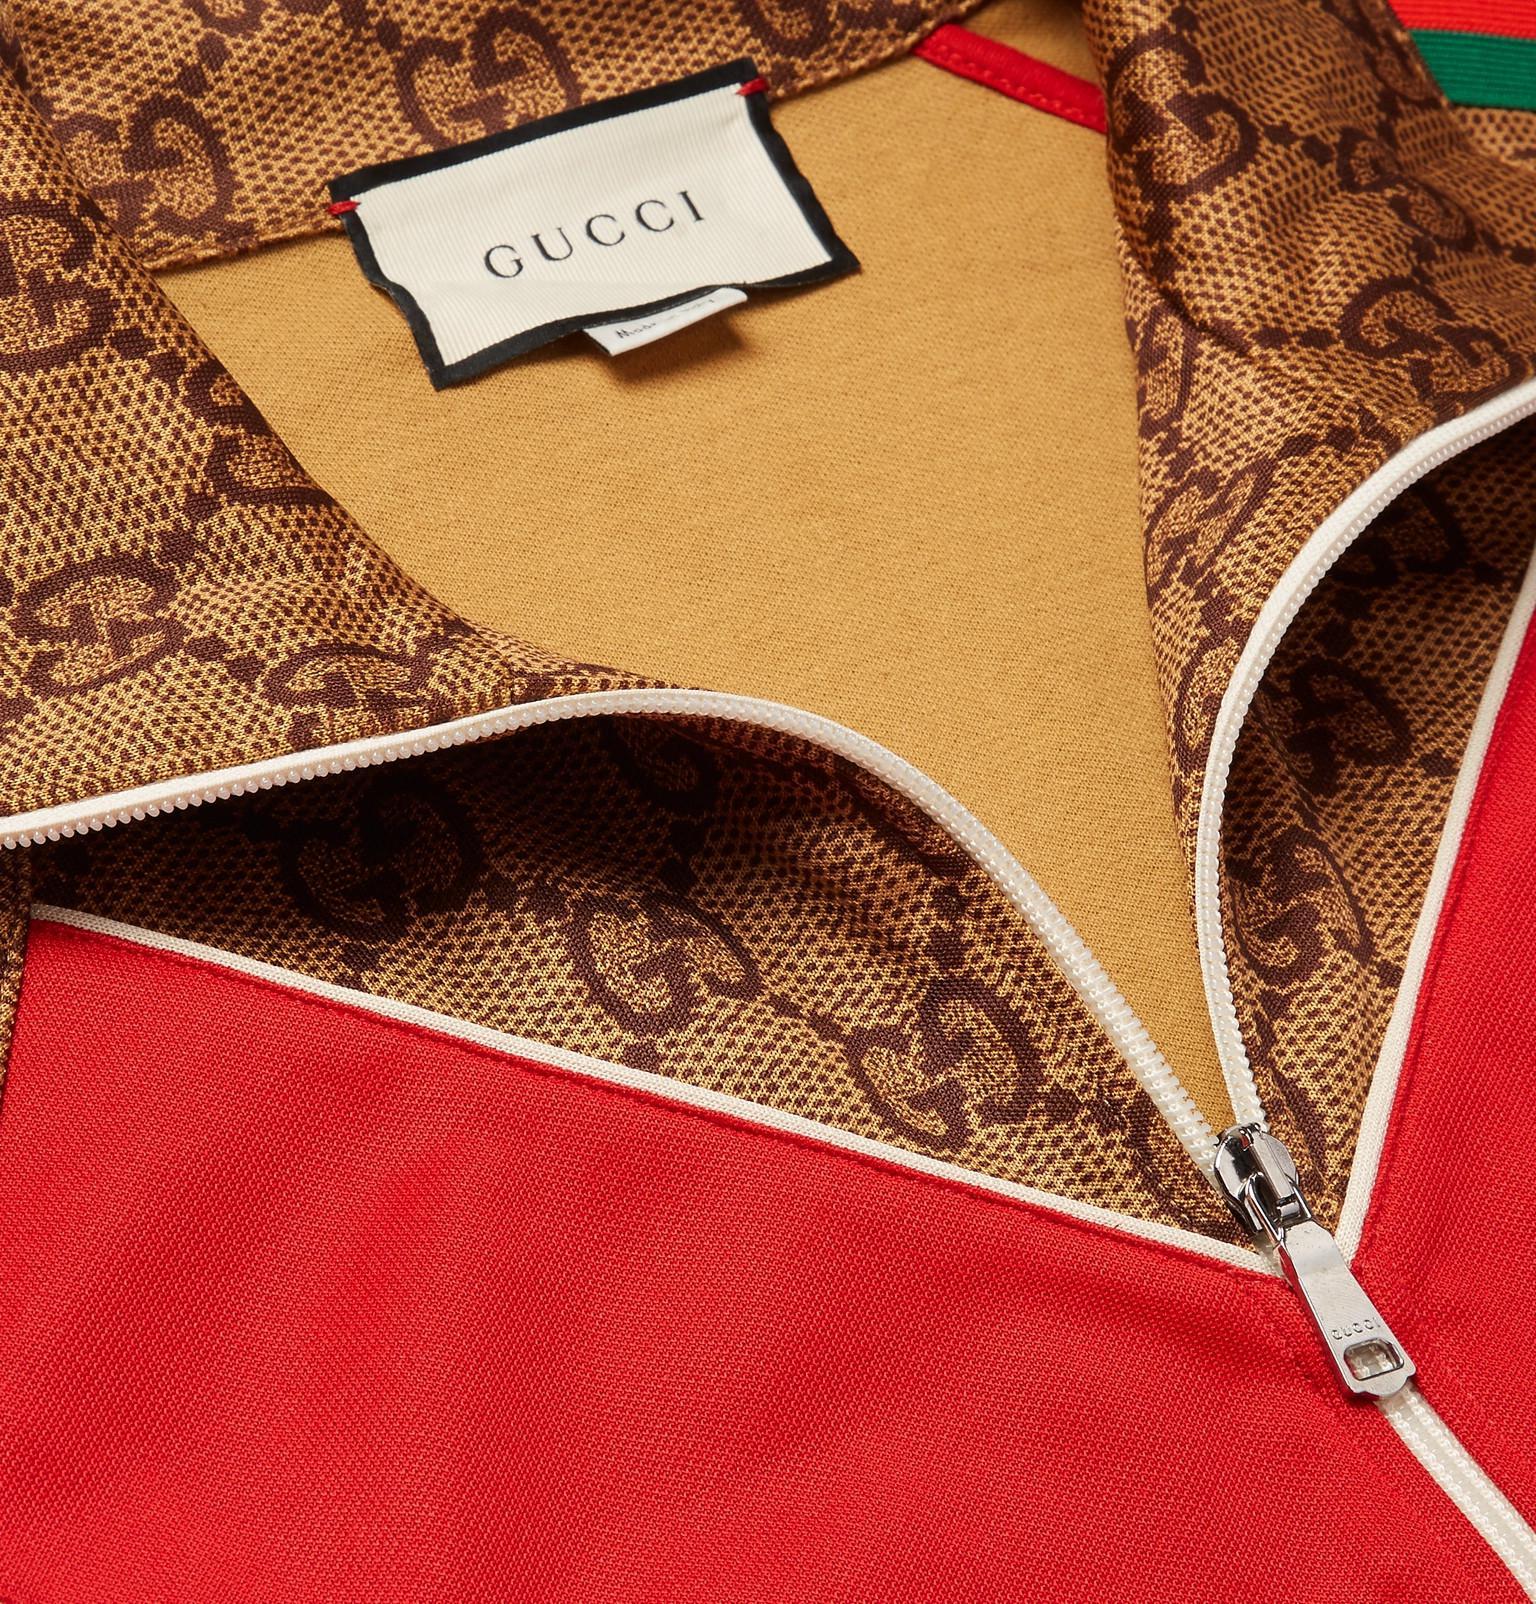 d4ba7243174 Gucci - Brown Oversized Webbing-trimmed Logo-print Tech-jersey Track Jacket  for. View fullscreen